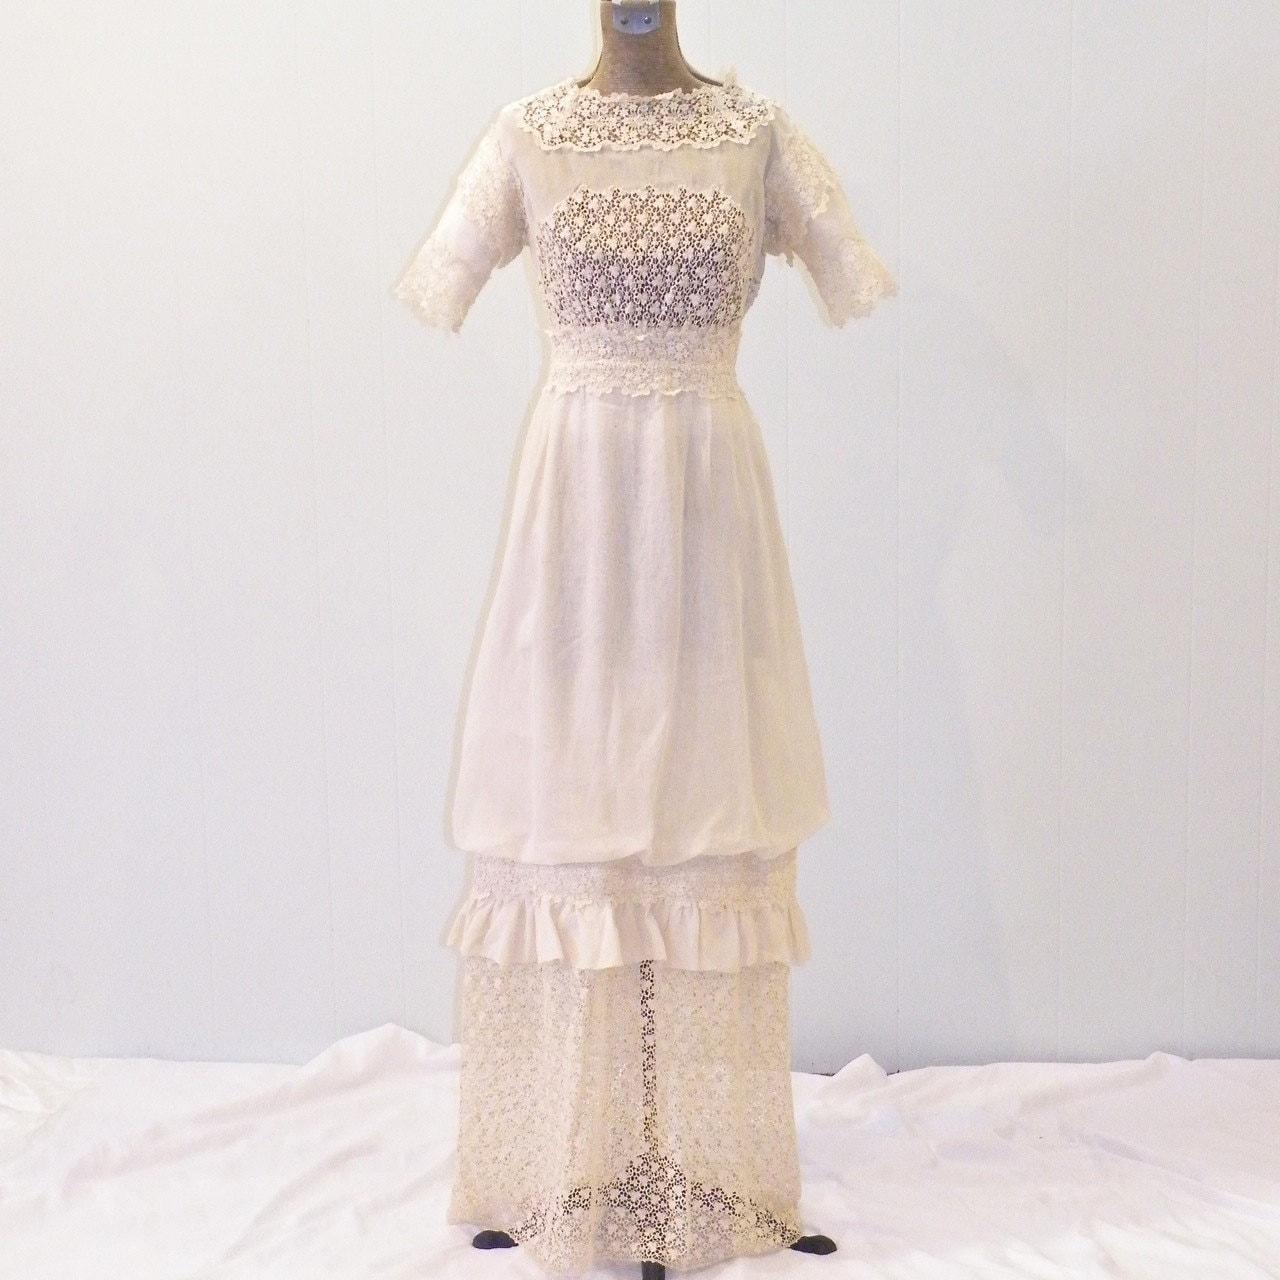 Edwardian Dress 1900s 1910s Antique Crochet Lace By